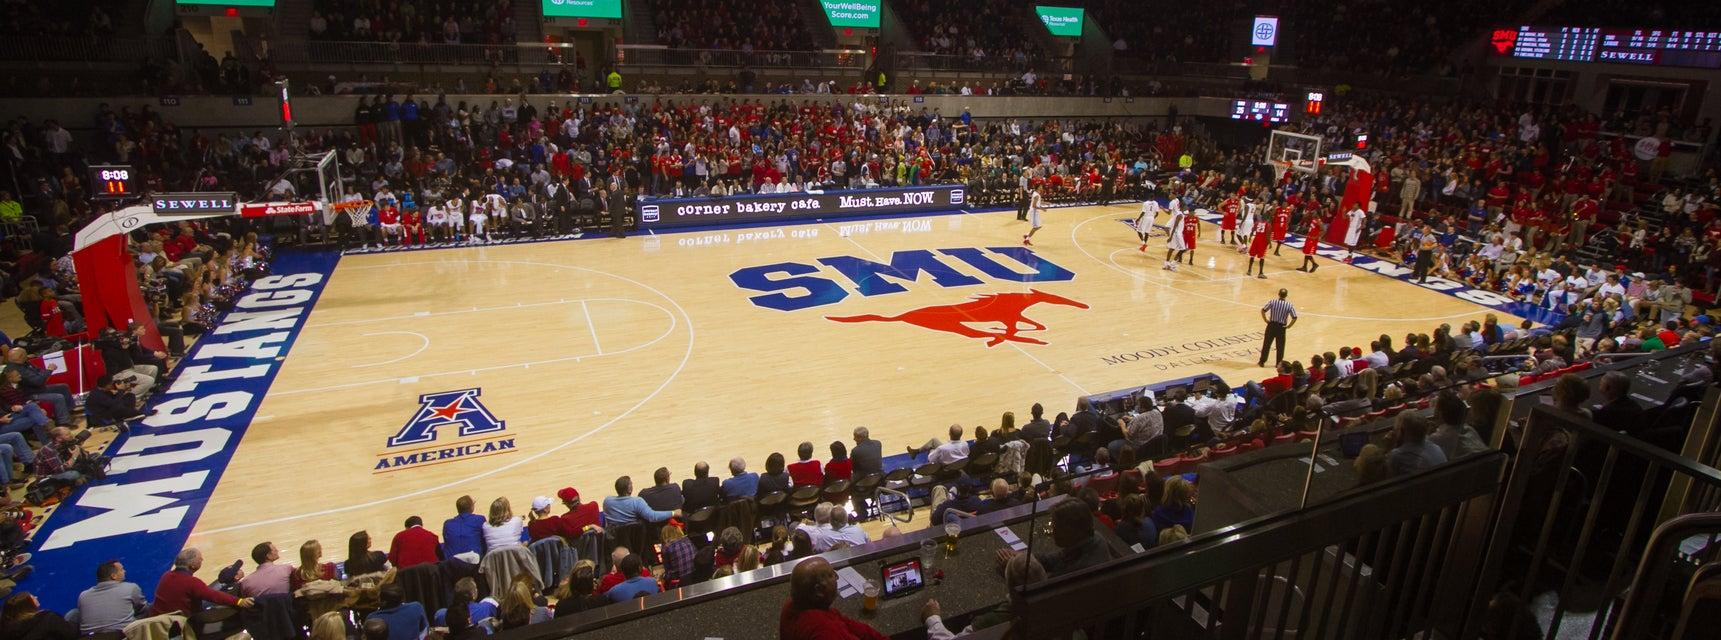 SMU Basketball Tickets